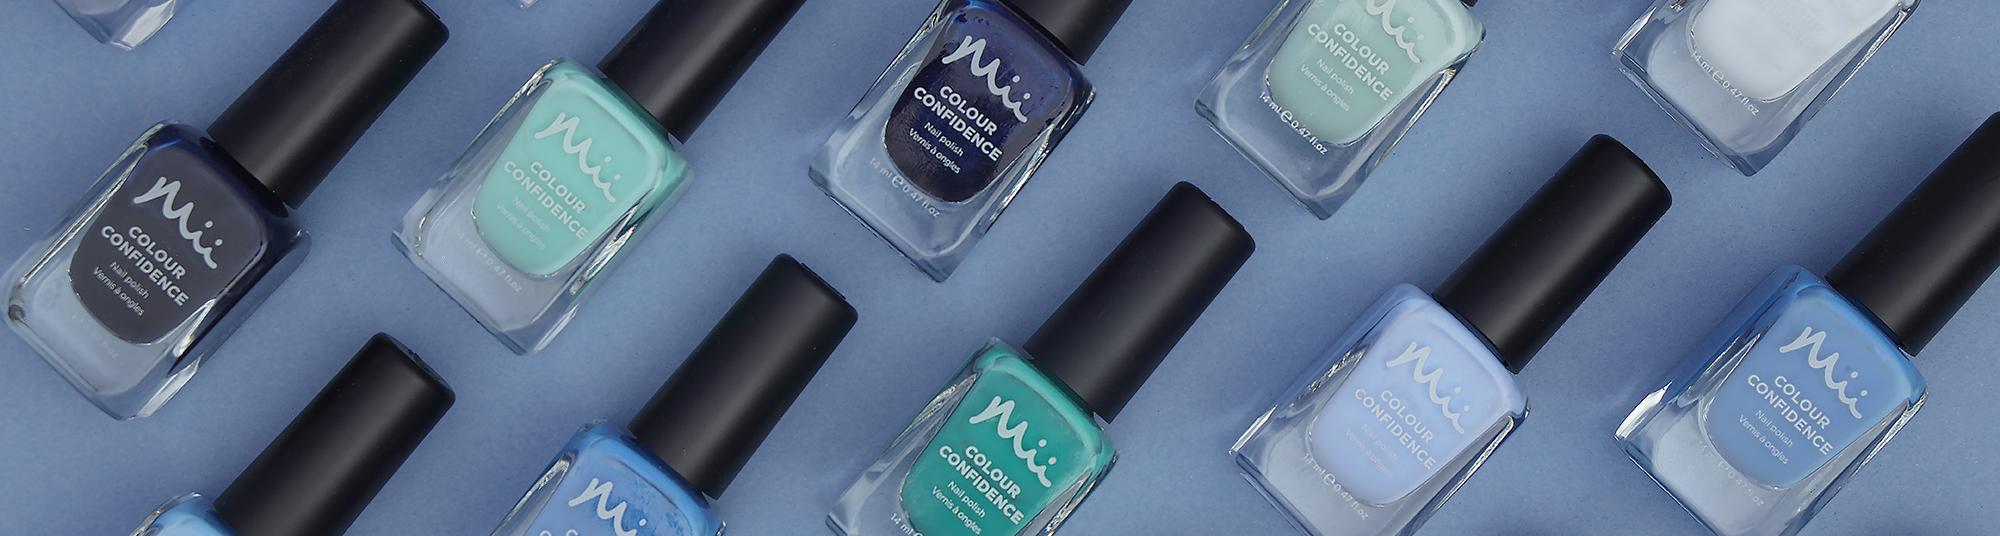 Mii Mii Colour Confidence Nail Polish Green & Blue Category